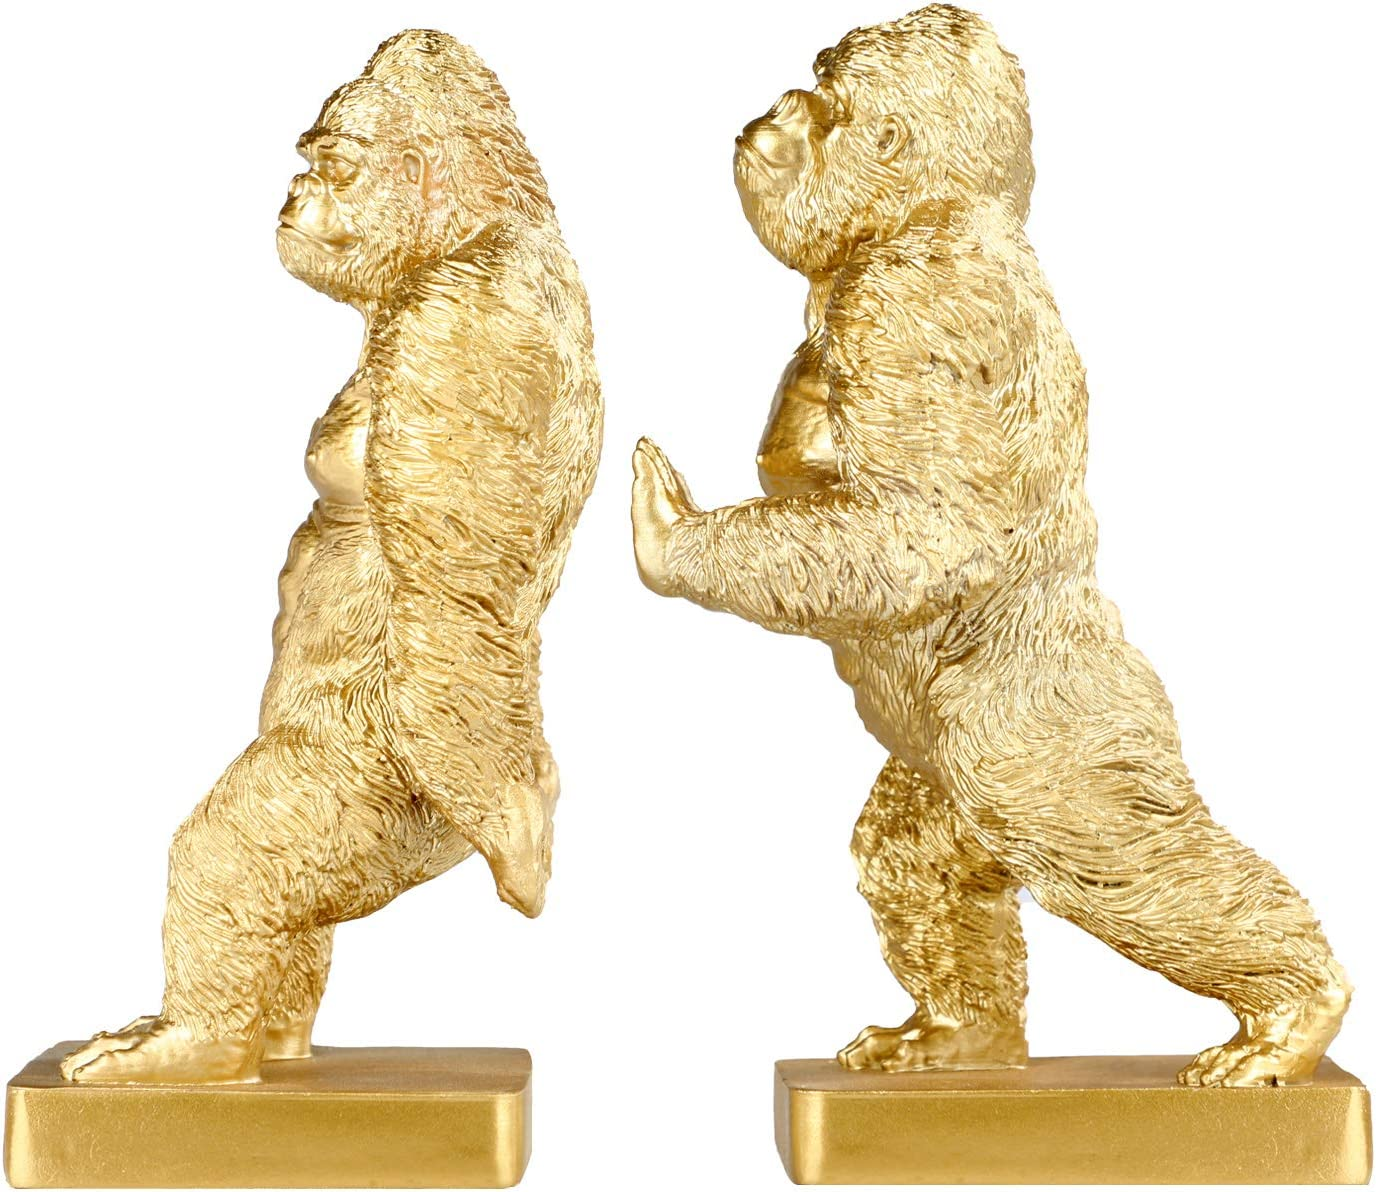 Set of 2 Polyresin Faux Kingkong Bookend, Gorrila Art bookend, Homedecor for Kids, Birthday Gift (Gold)